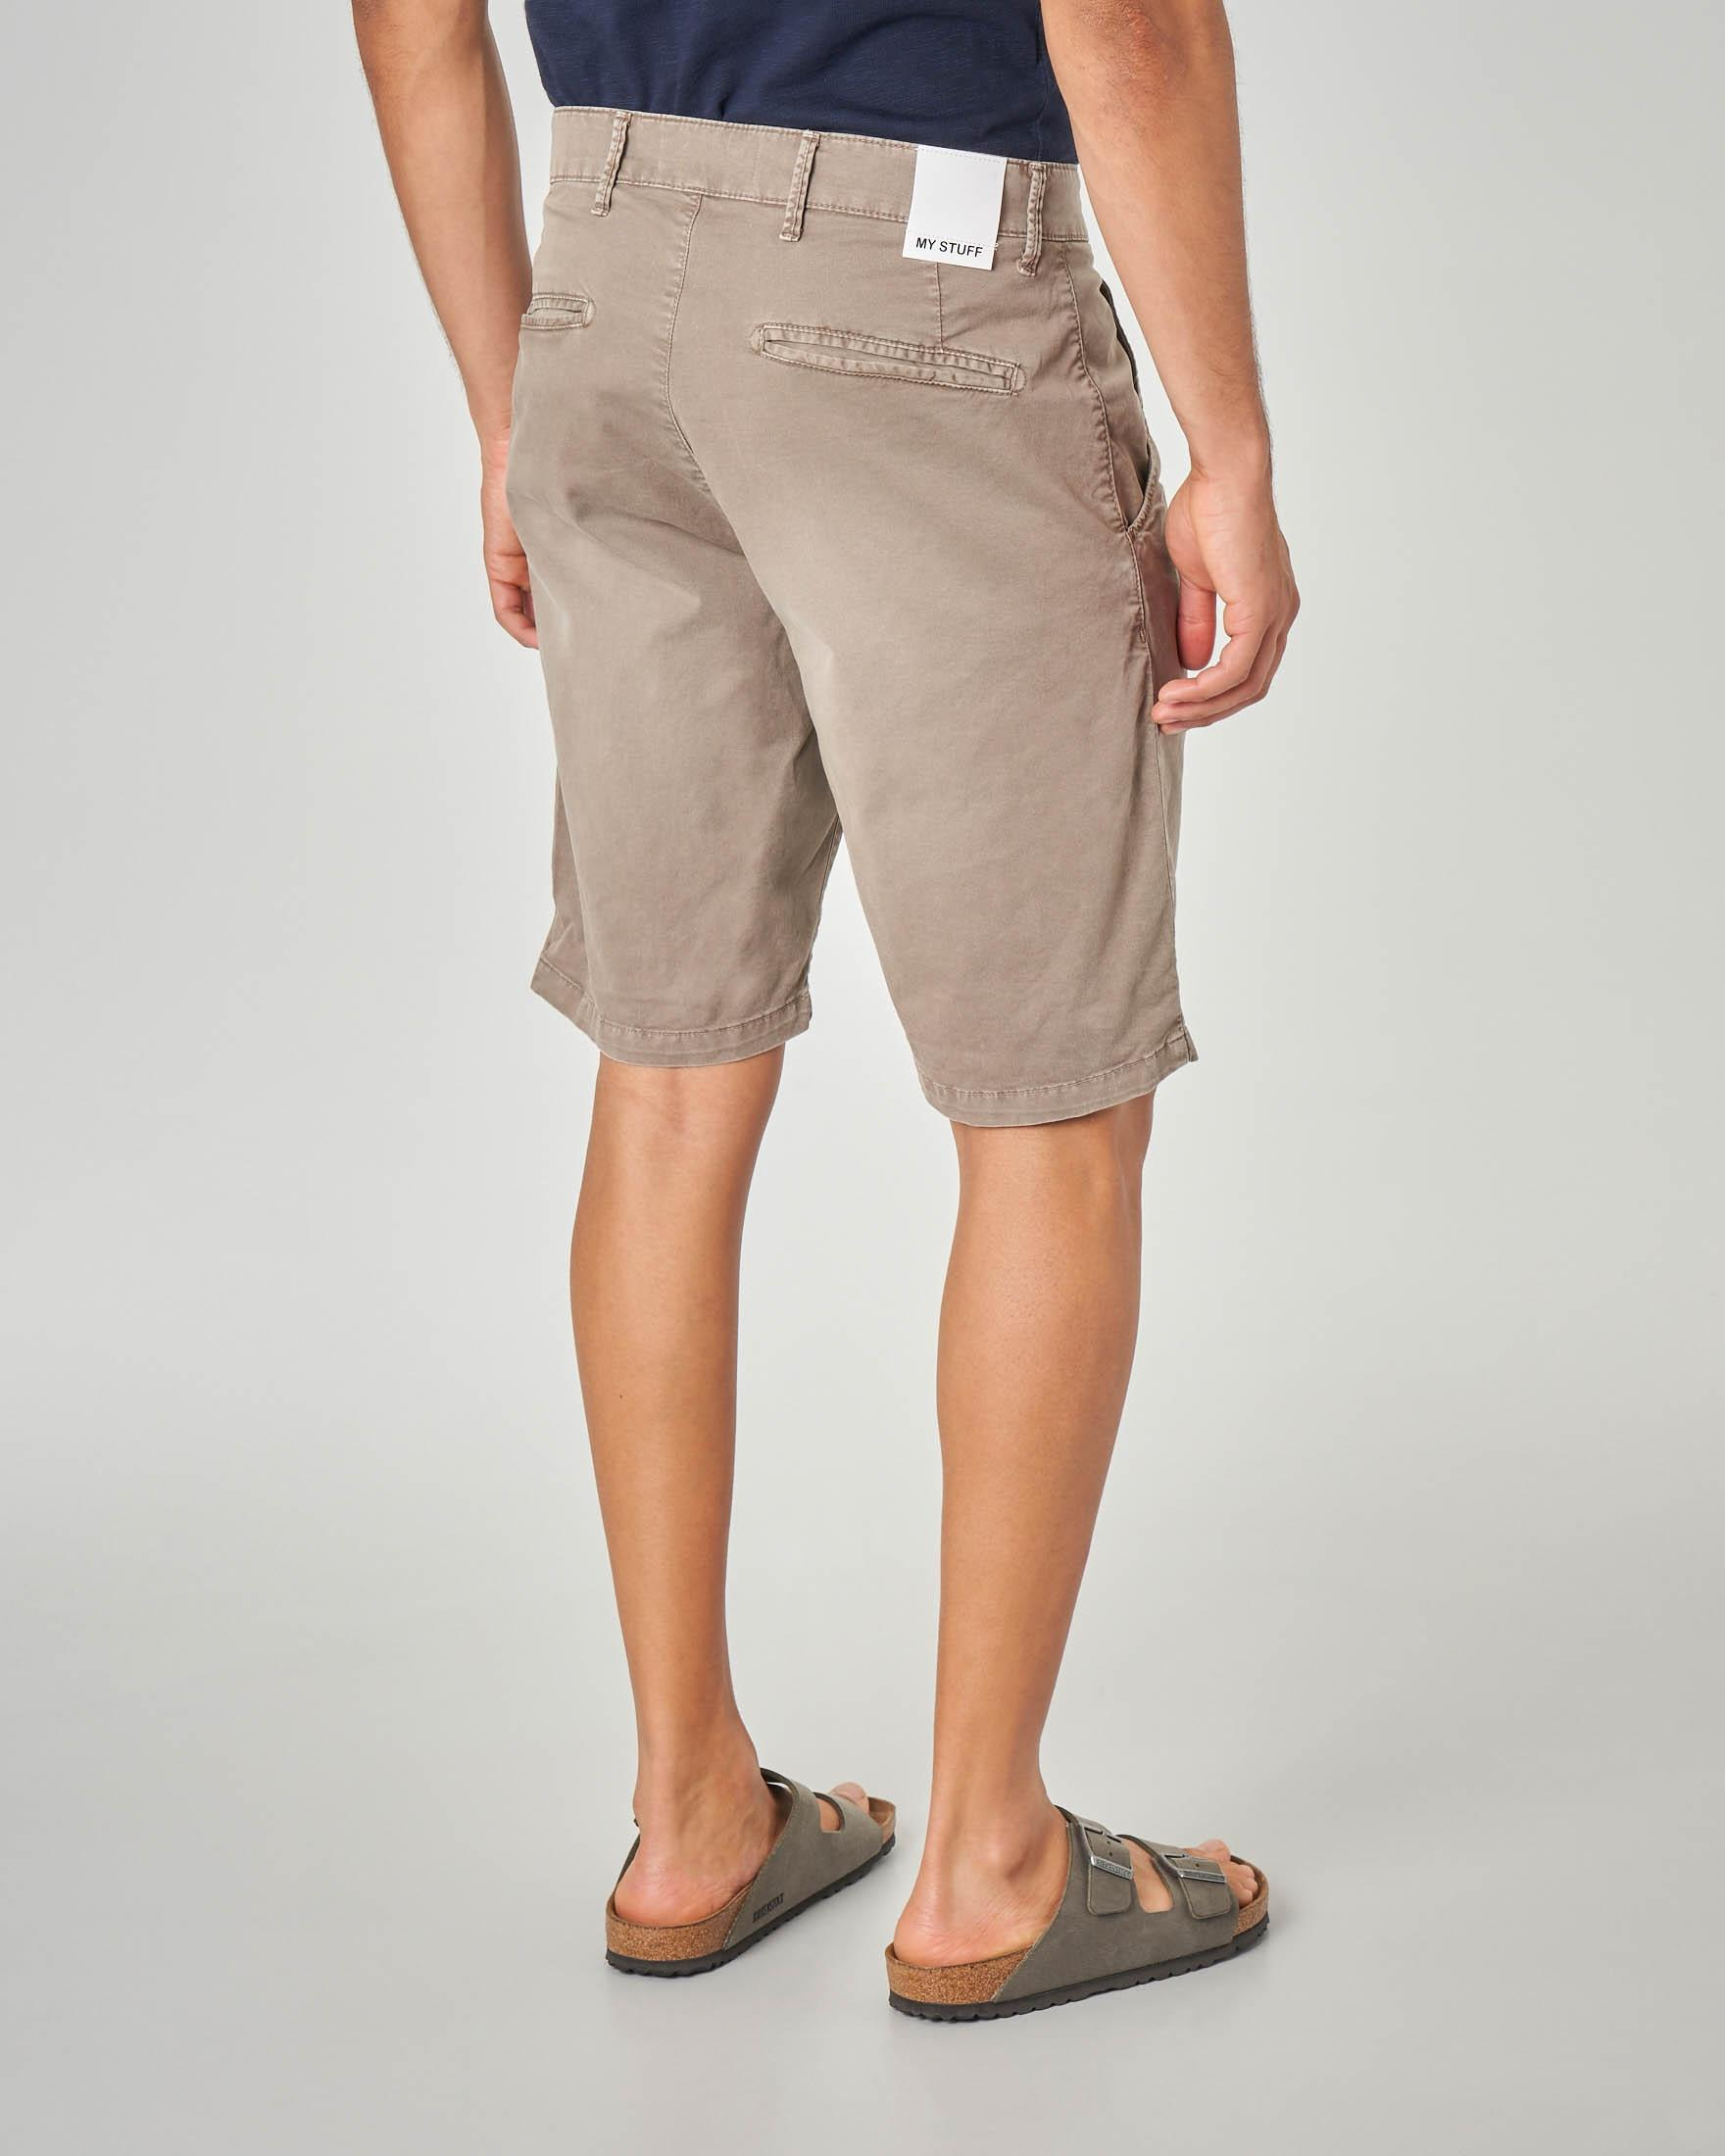 Bermuda chino beige lunghezza ginocchio